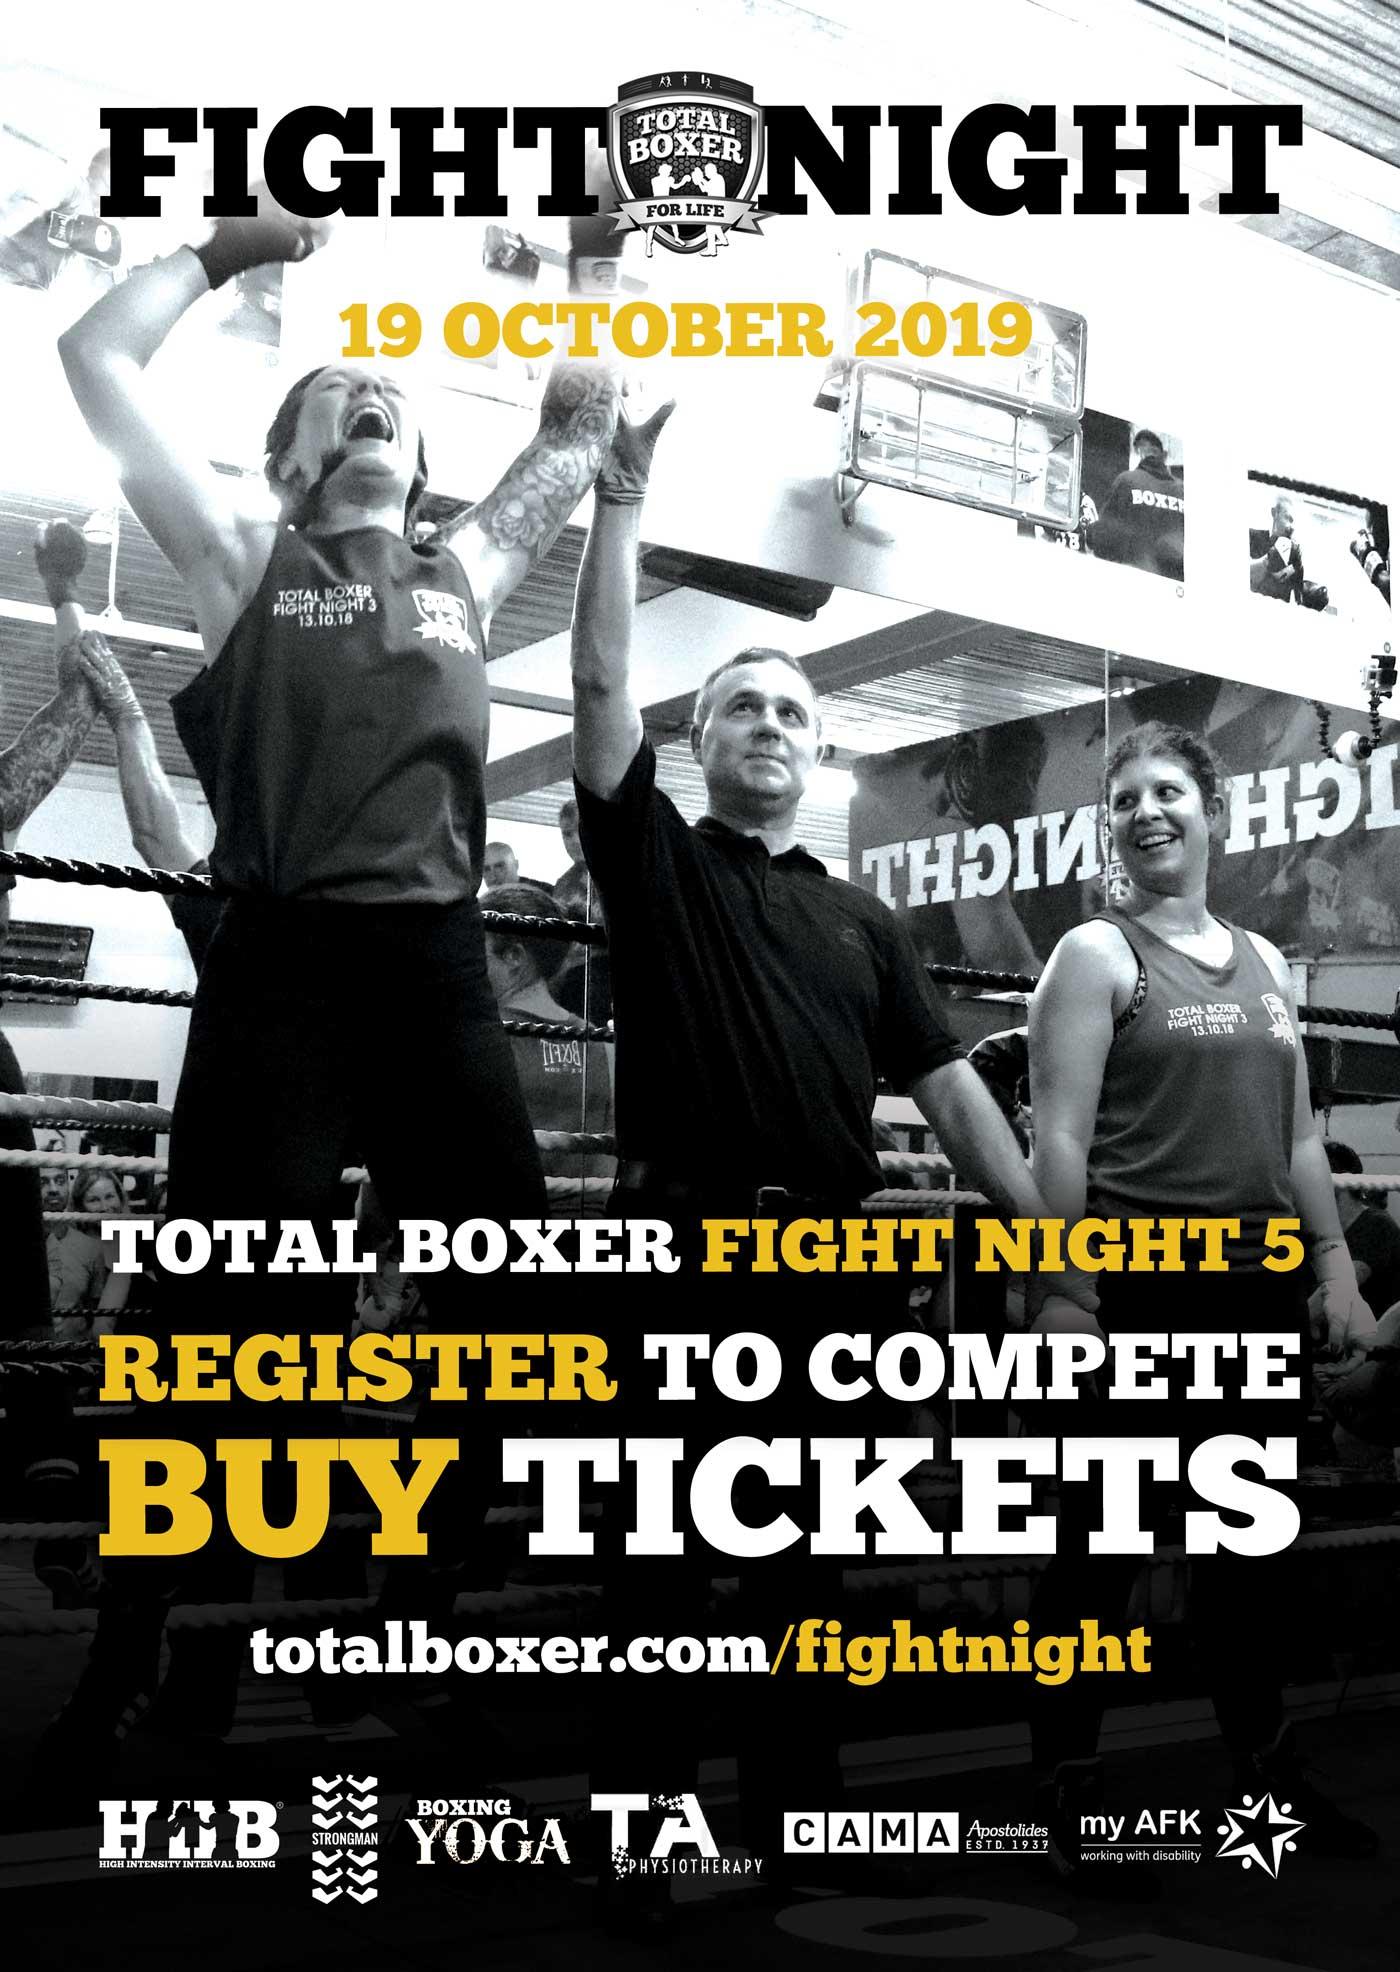 Fight-Night-5-Poster-Web.jpg